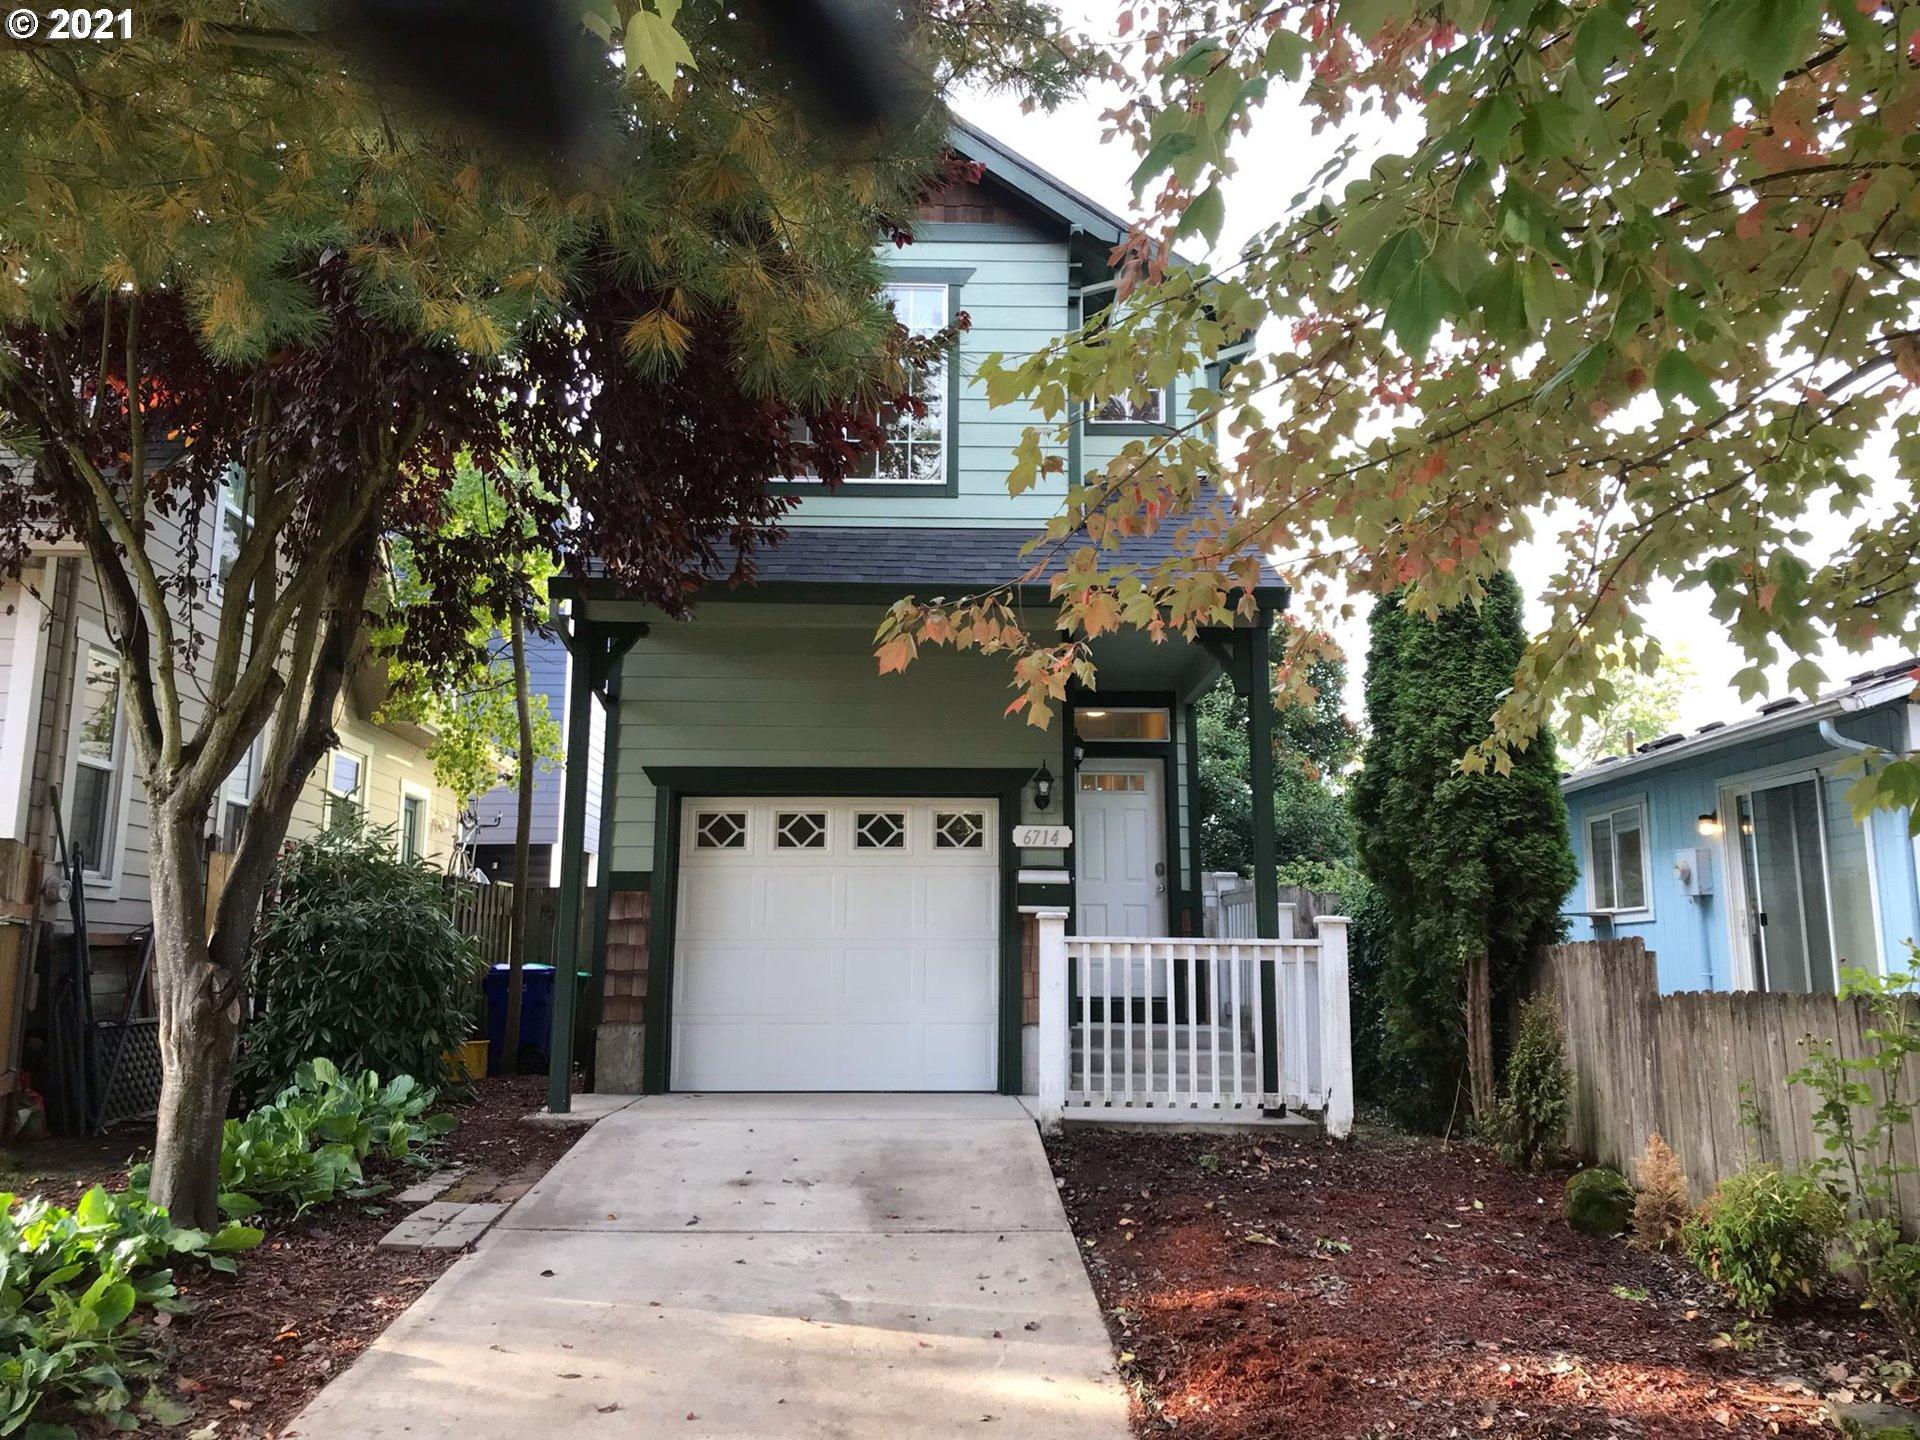 6714 N SENECA ST, Portland OR 97203